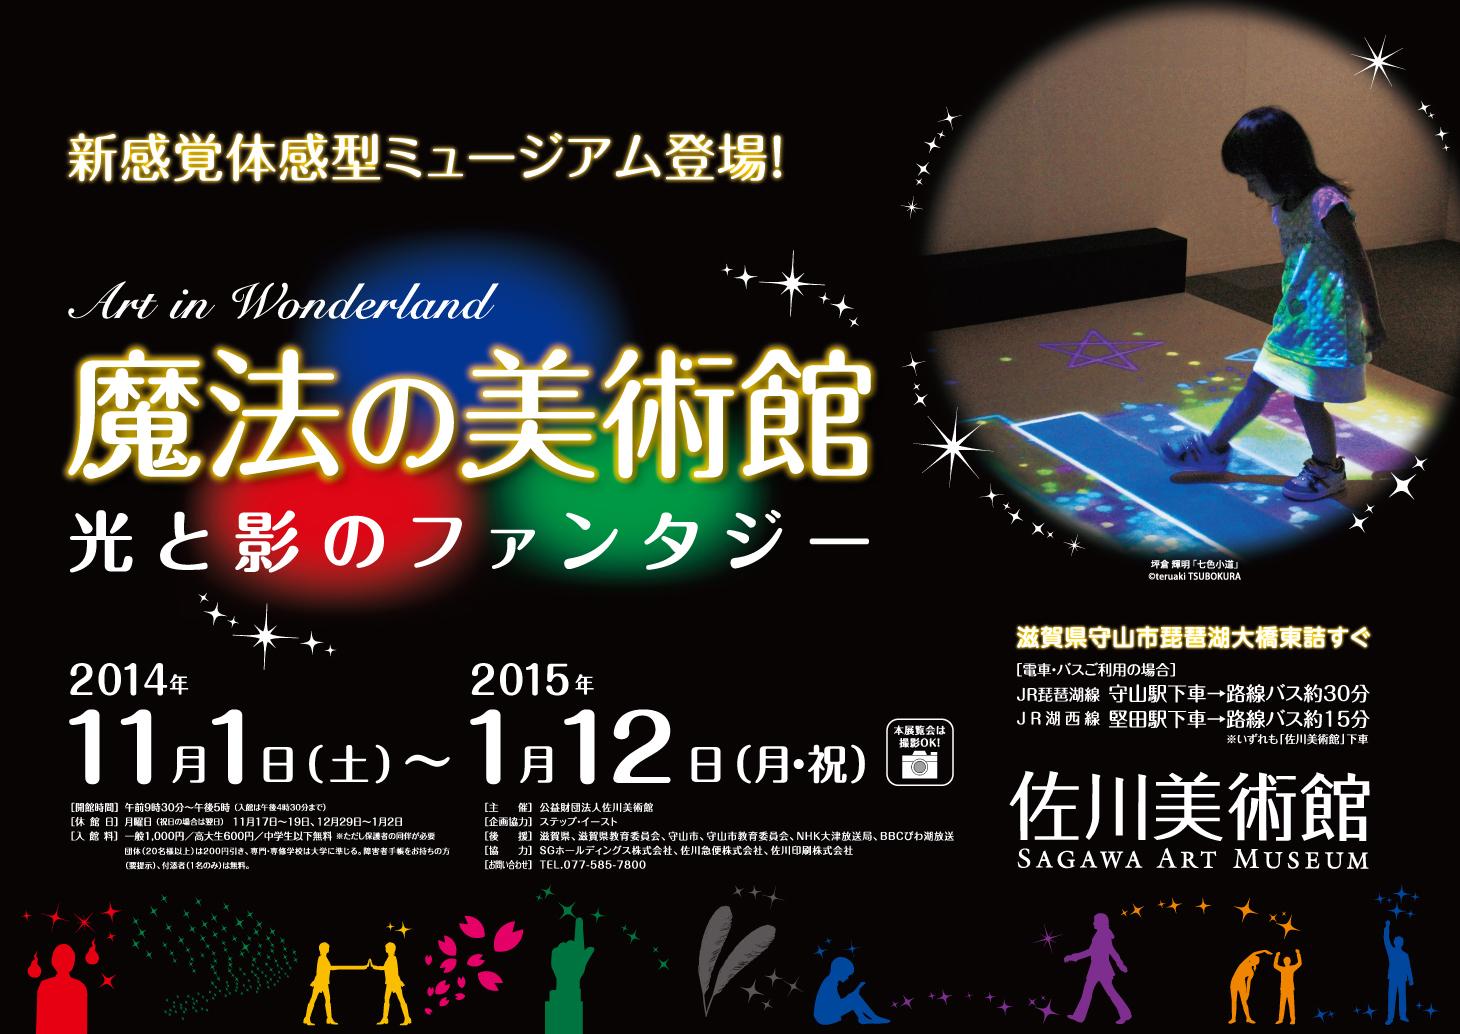 http://www.sagawa-artmuseum.or.jp/plan/G02-B3%E8%A8%82%E6%AD%A31002_%E4%B8%8B%E7%89%88.jpg